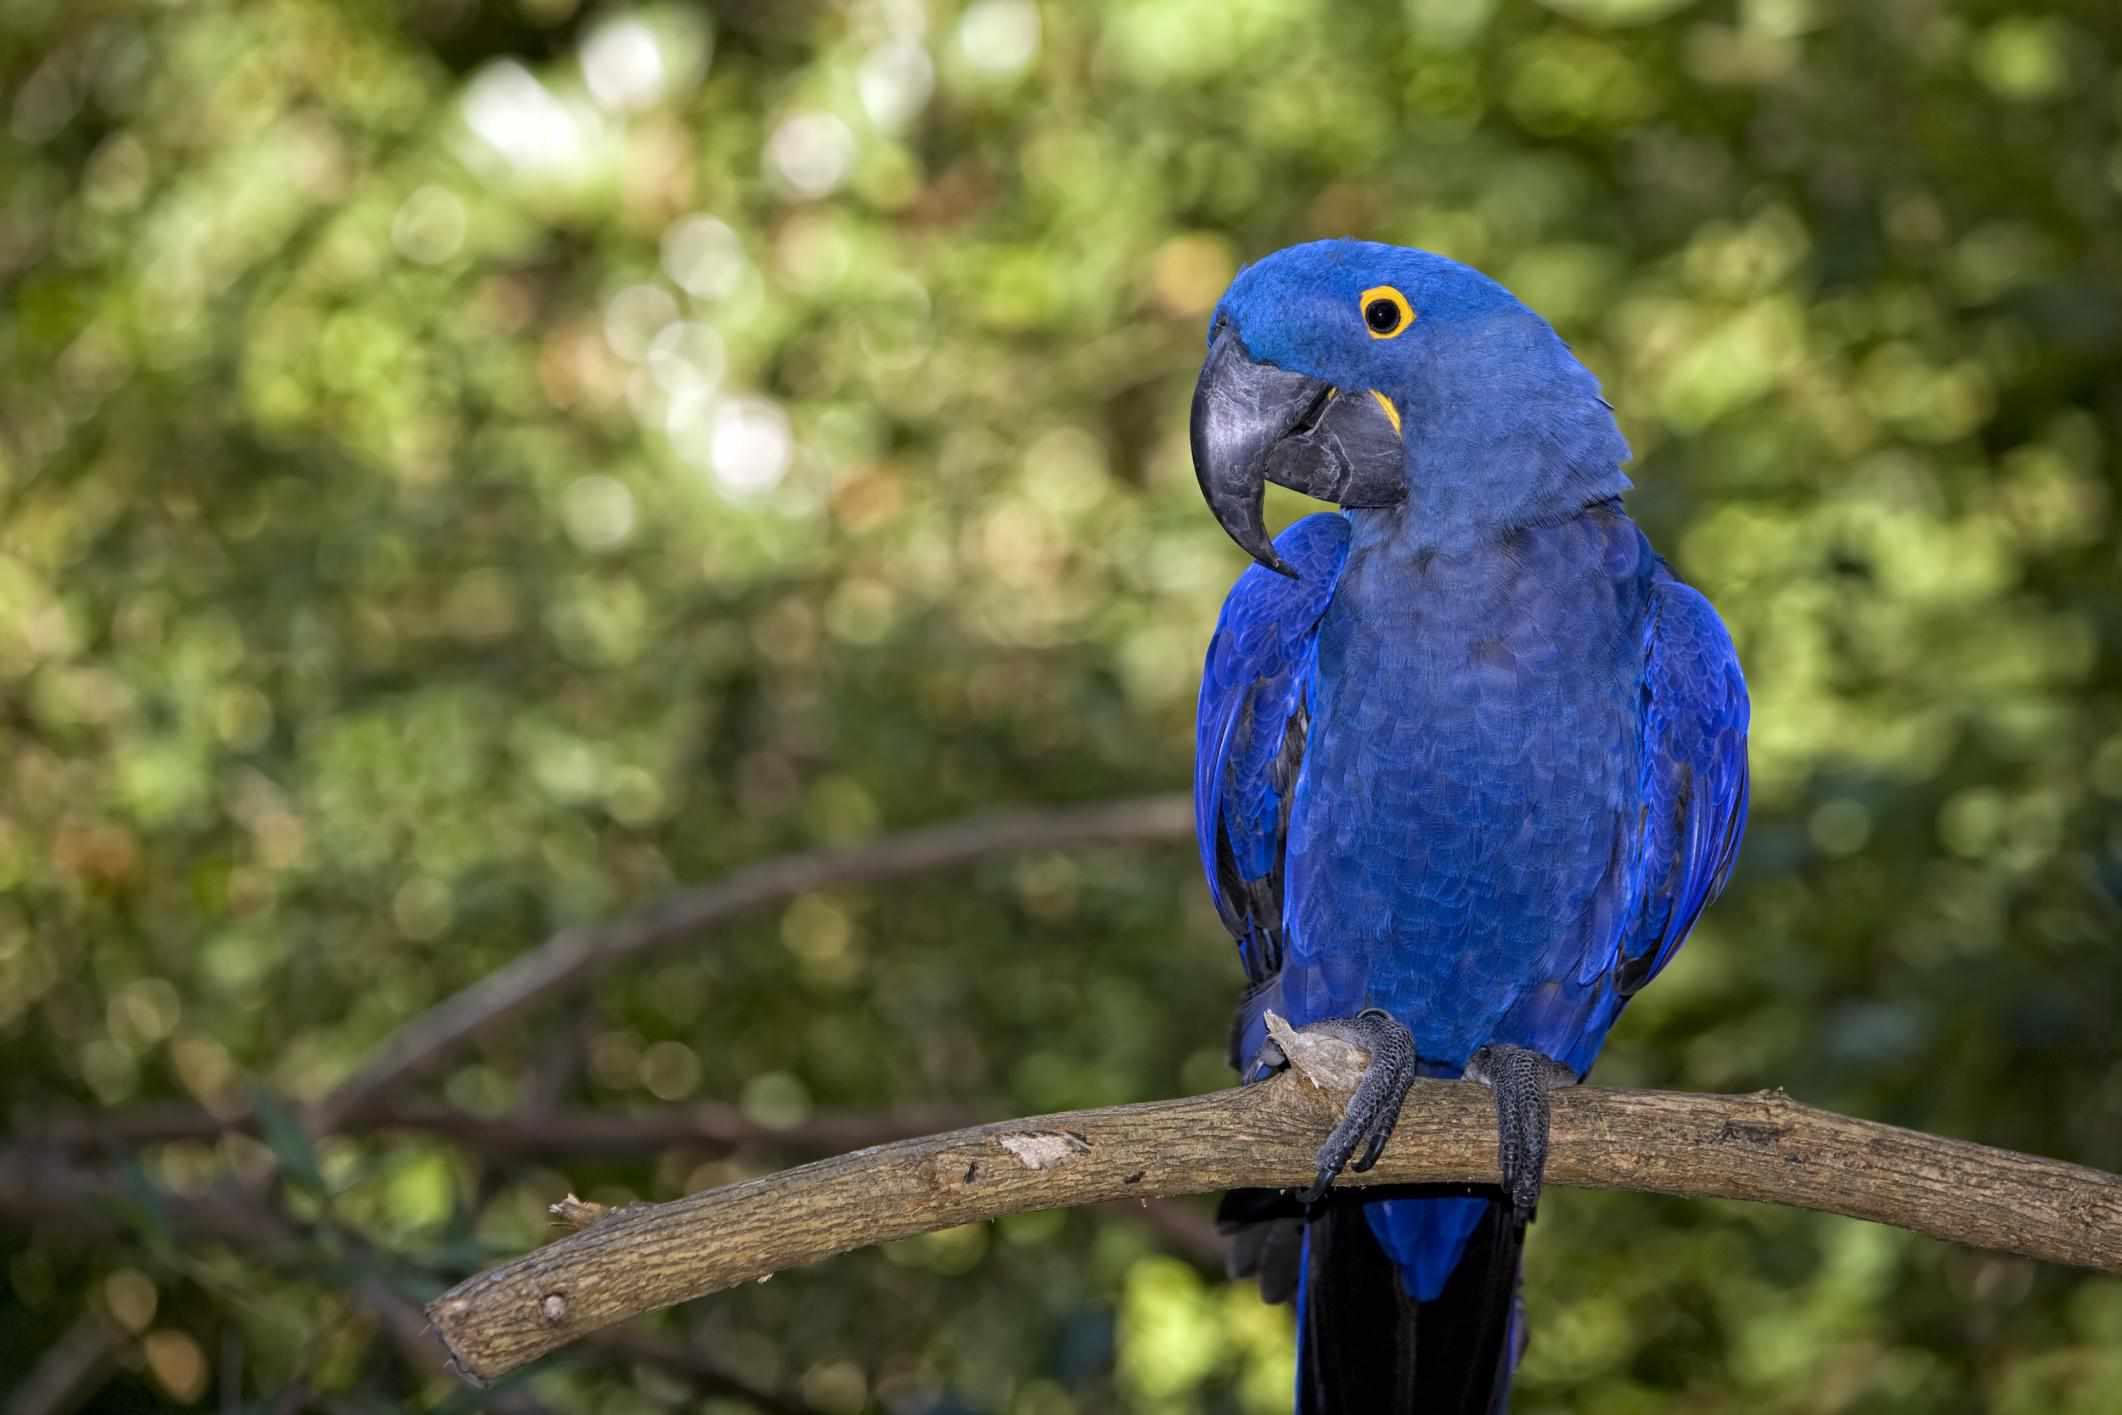 Hyacinth macaw on a branch